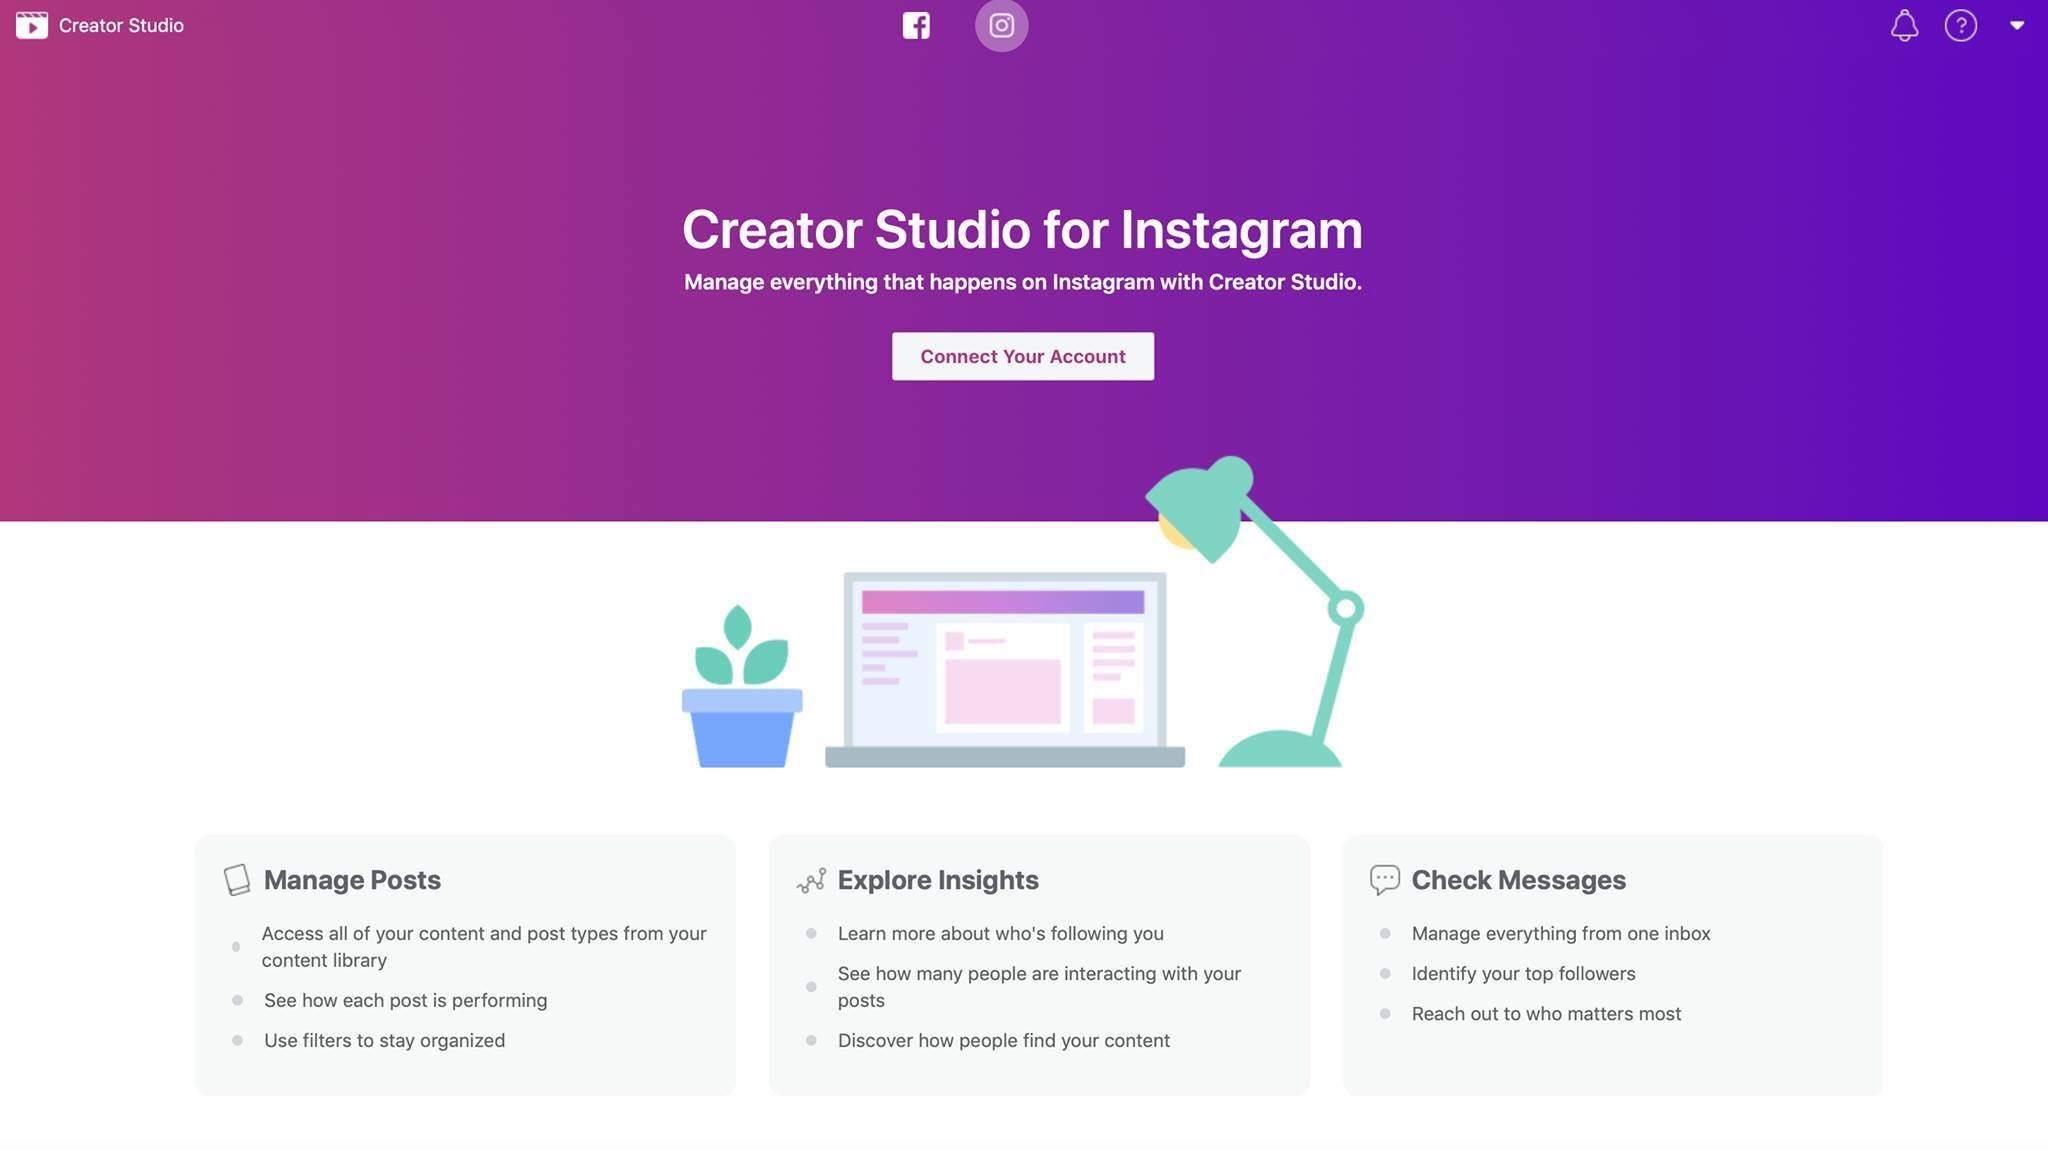 Facebookيتيح لك Creator Studio جدولة المشاركات Instagram